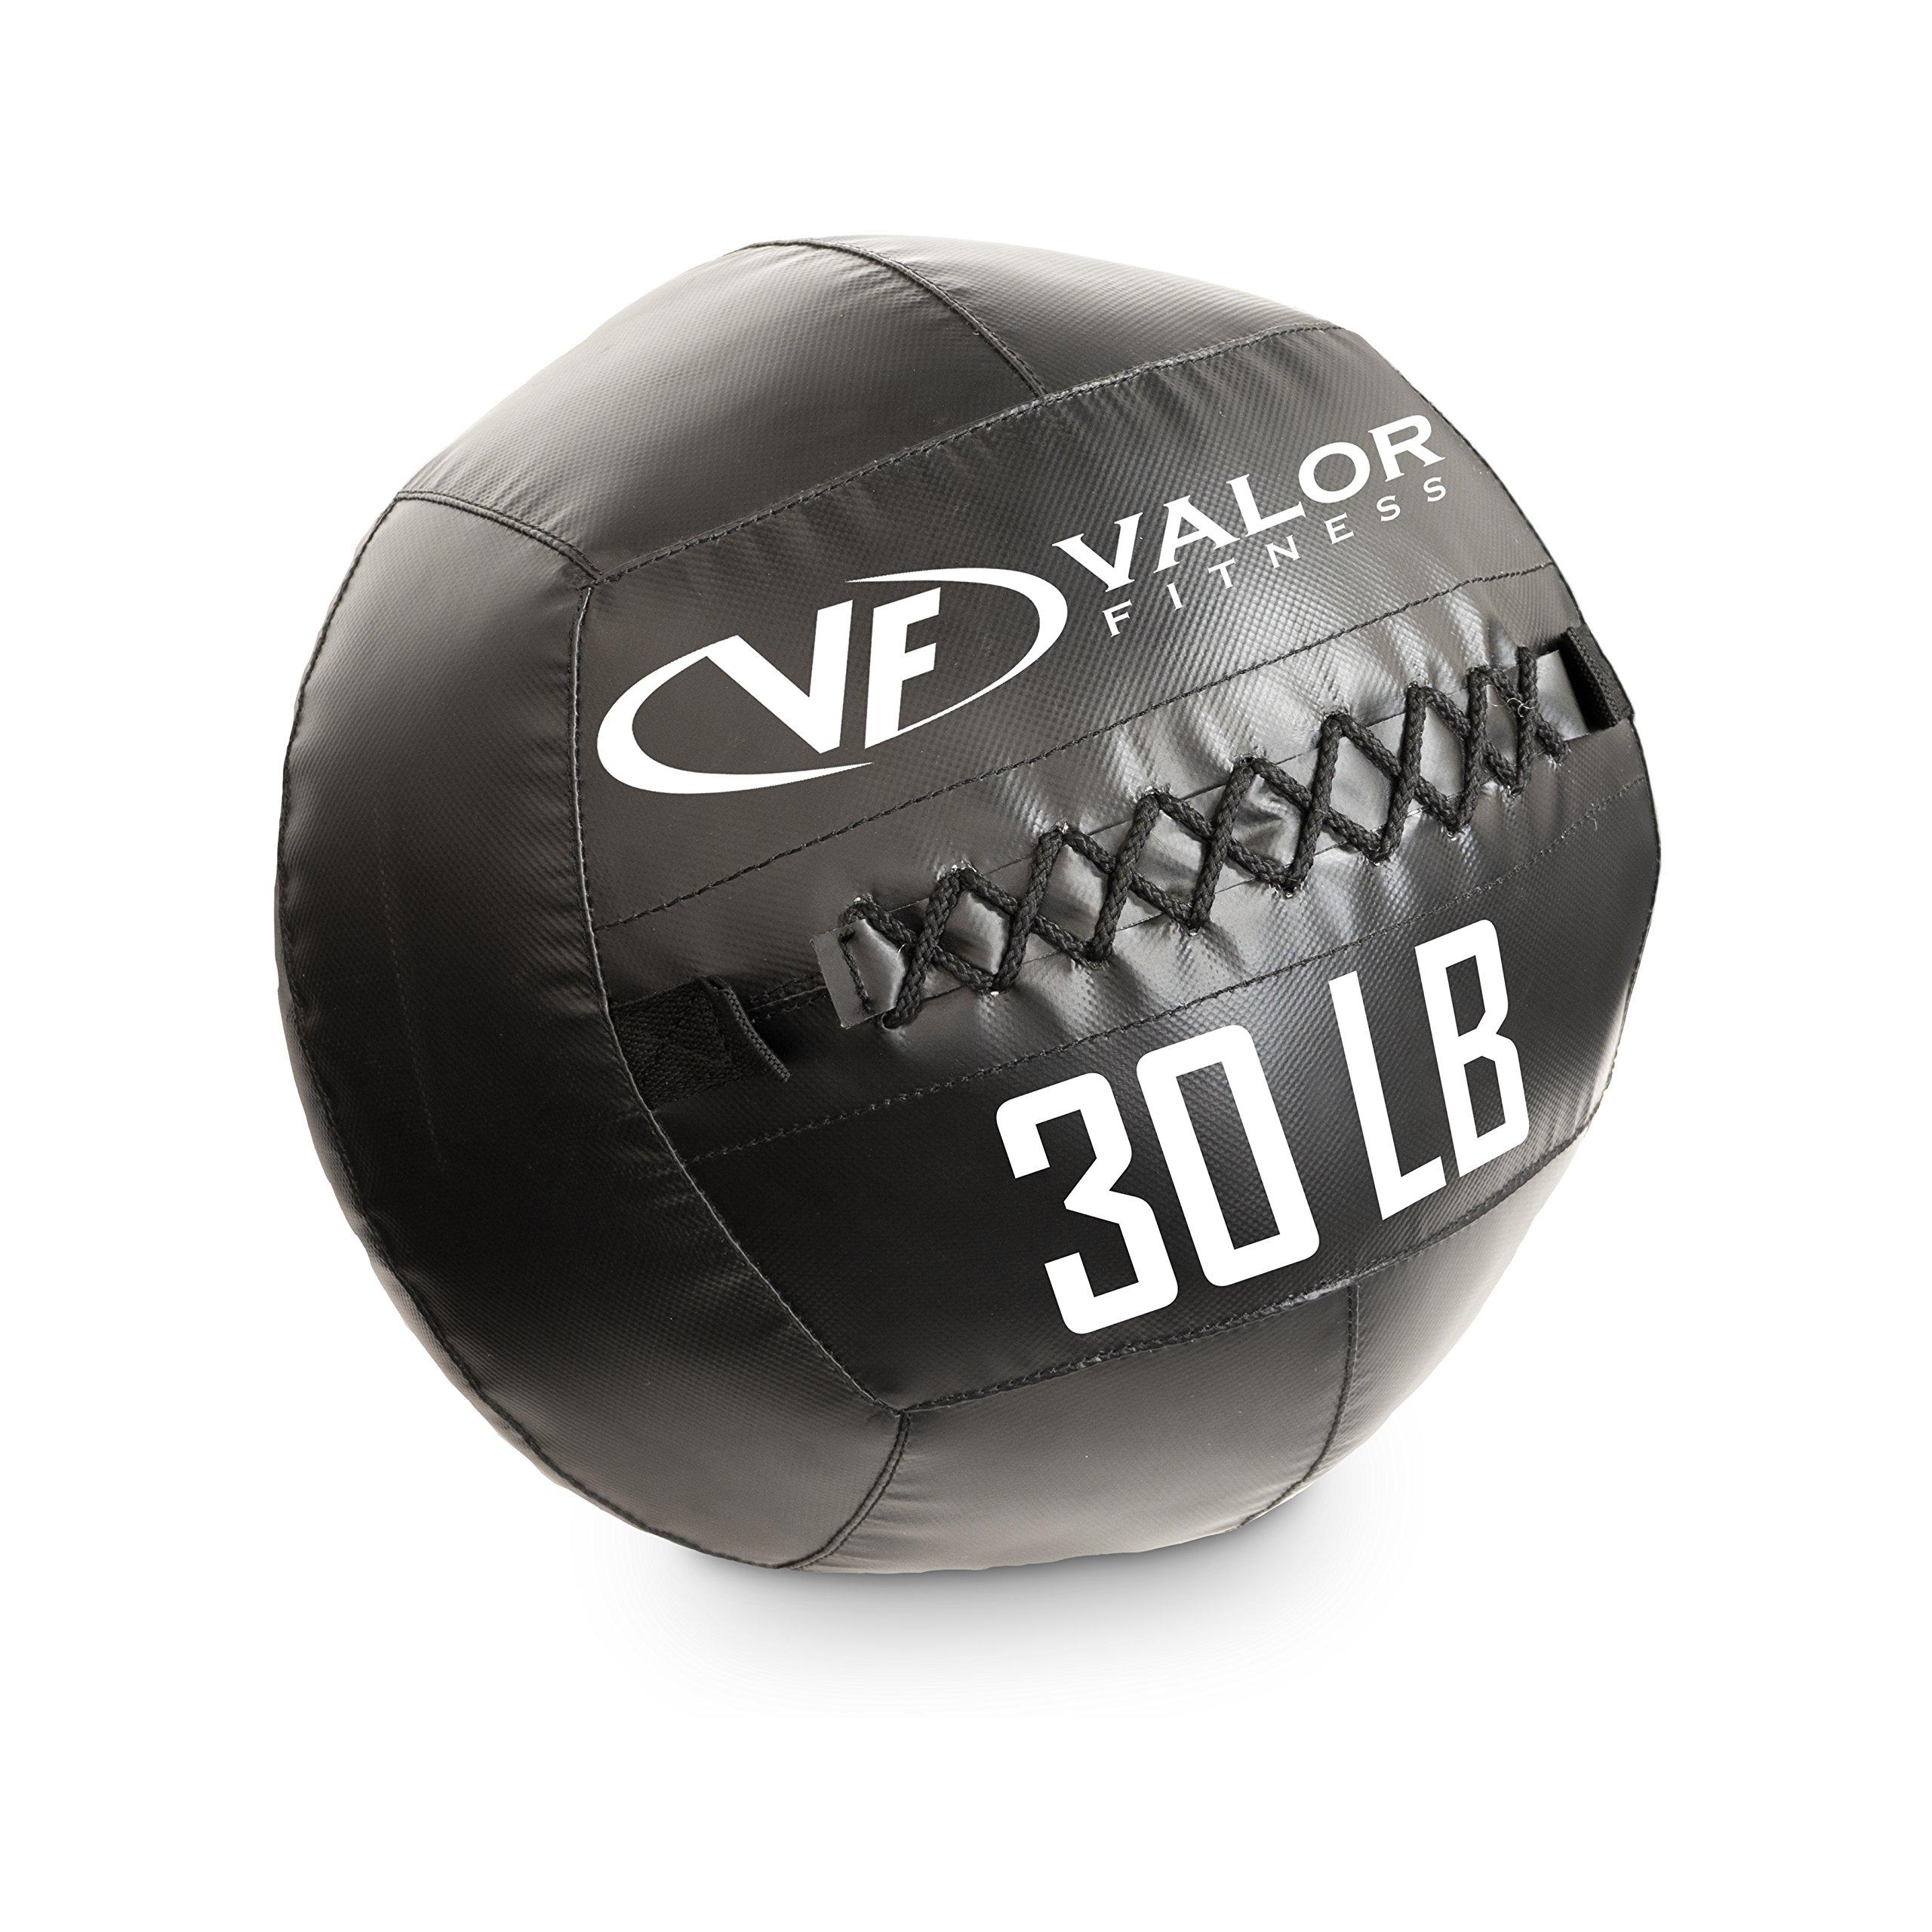 Valor Fitness WBP-30 Wall Ball Pro 30lb